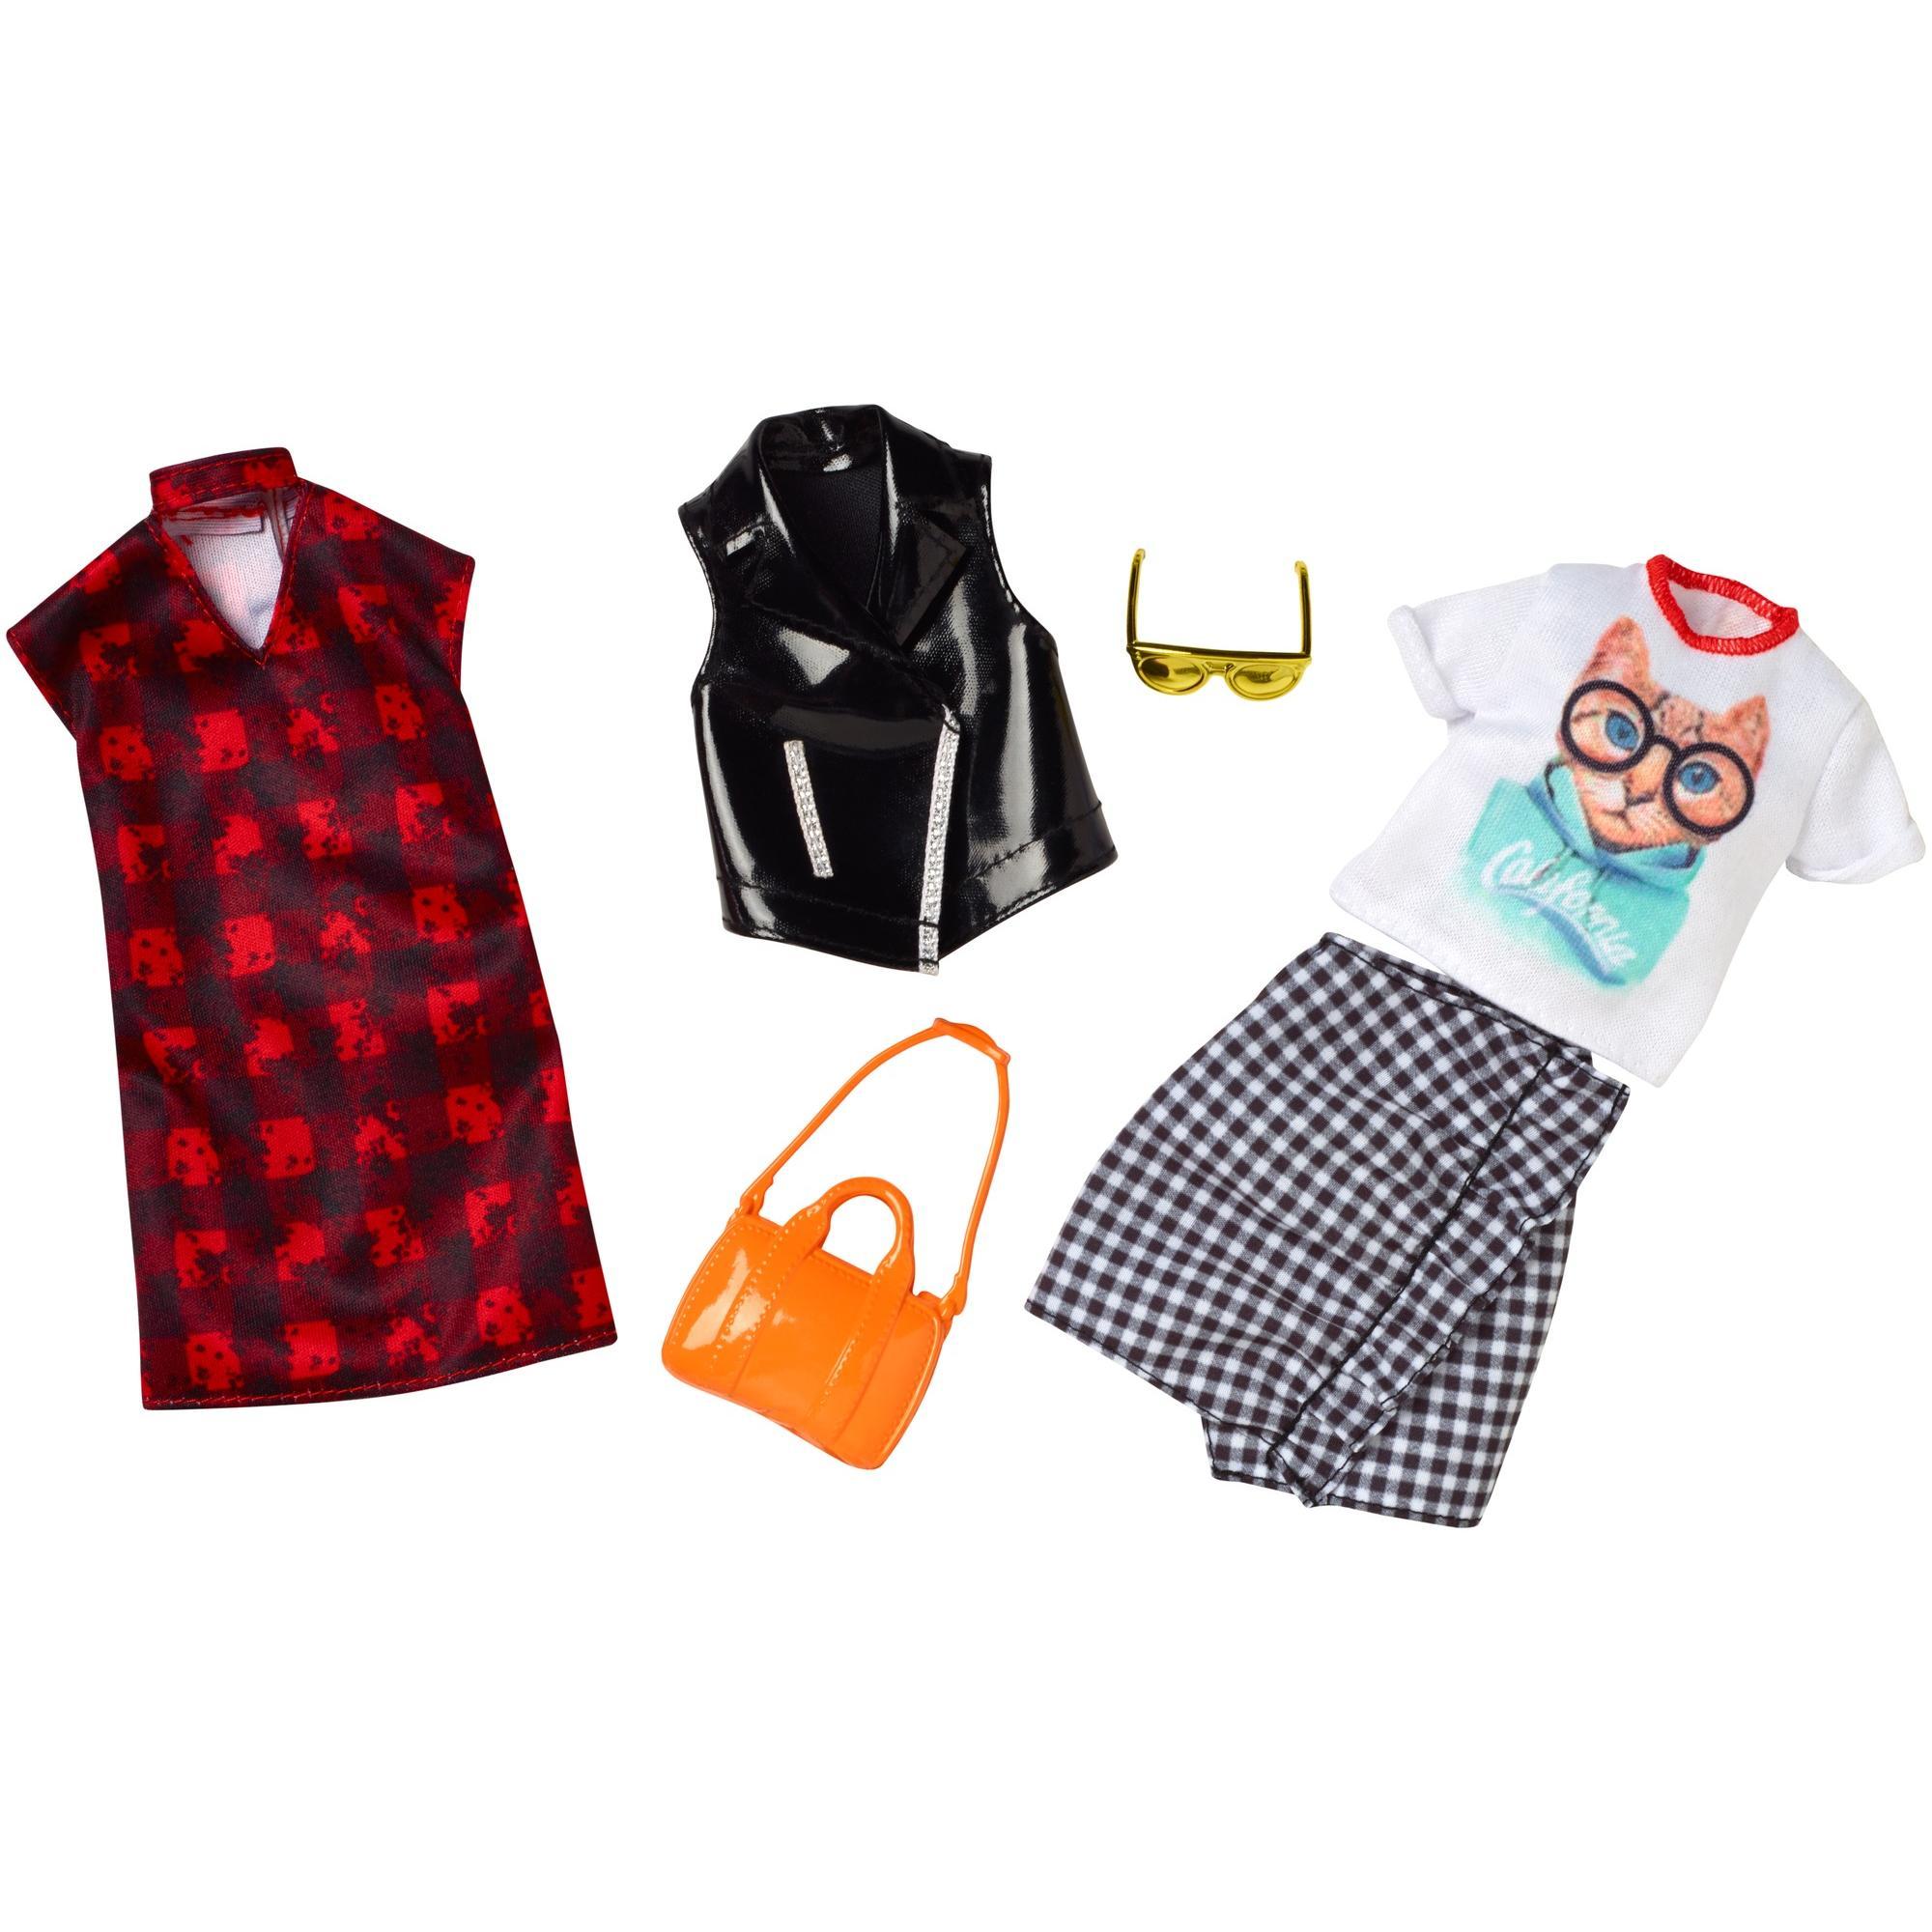 Barbie Choker Dress Fashion 2 Pack